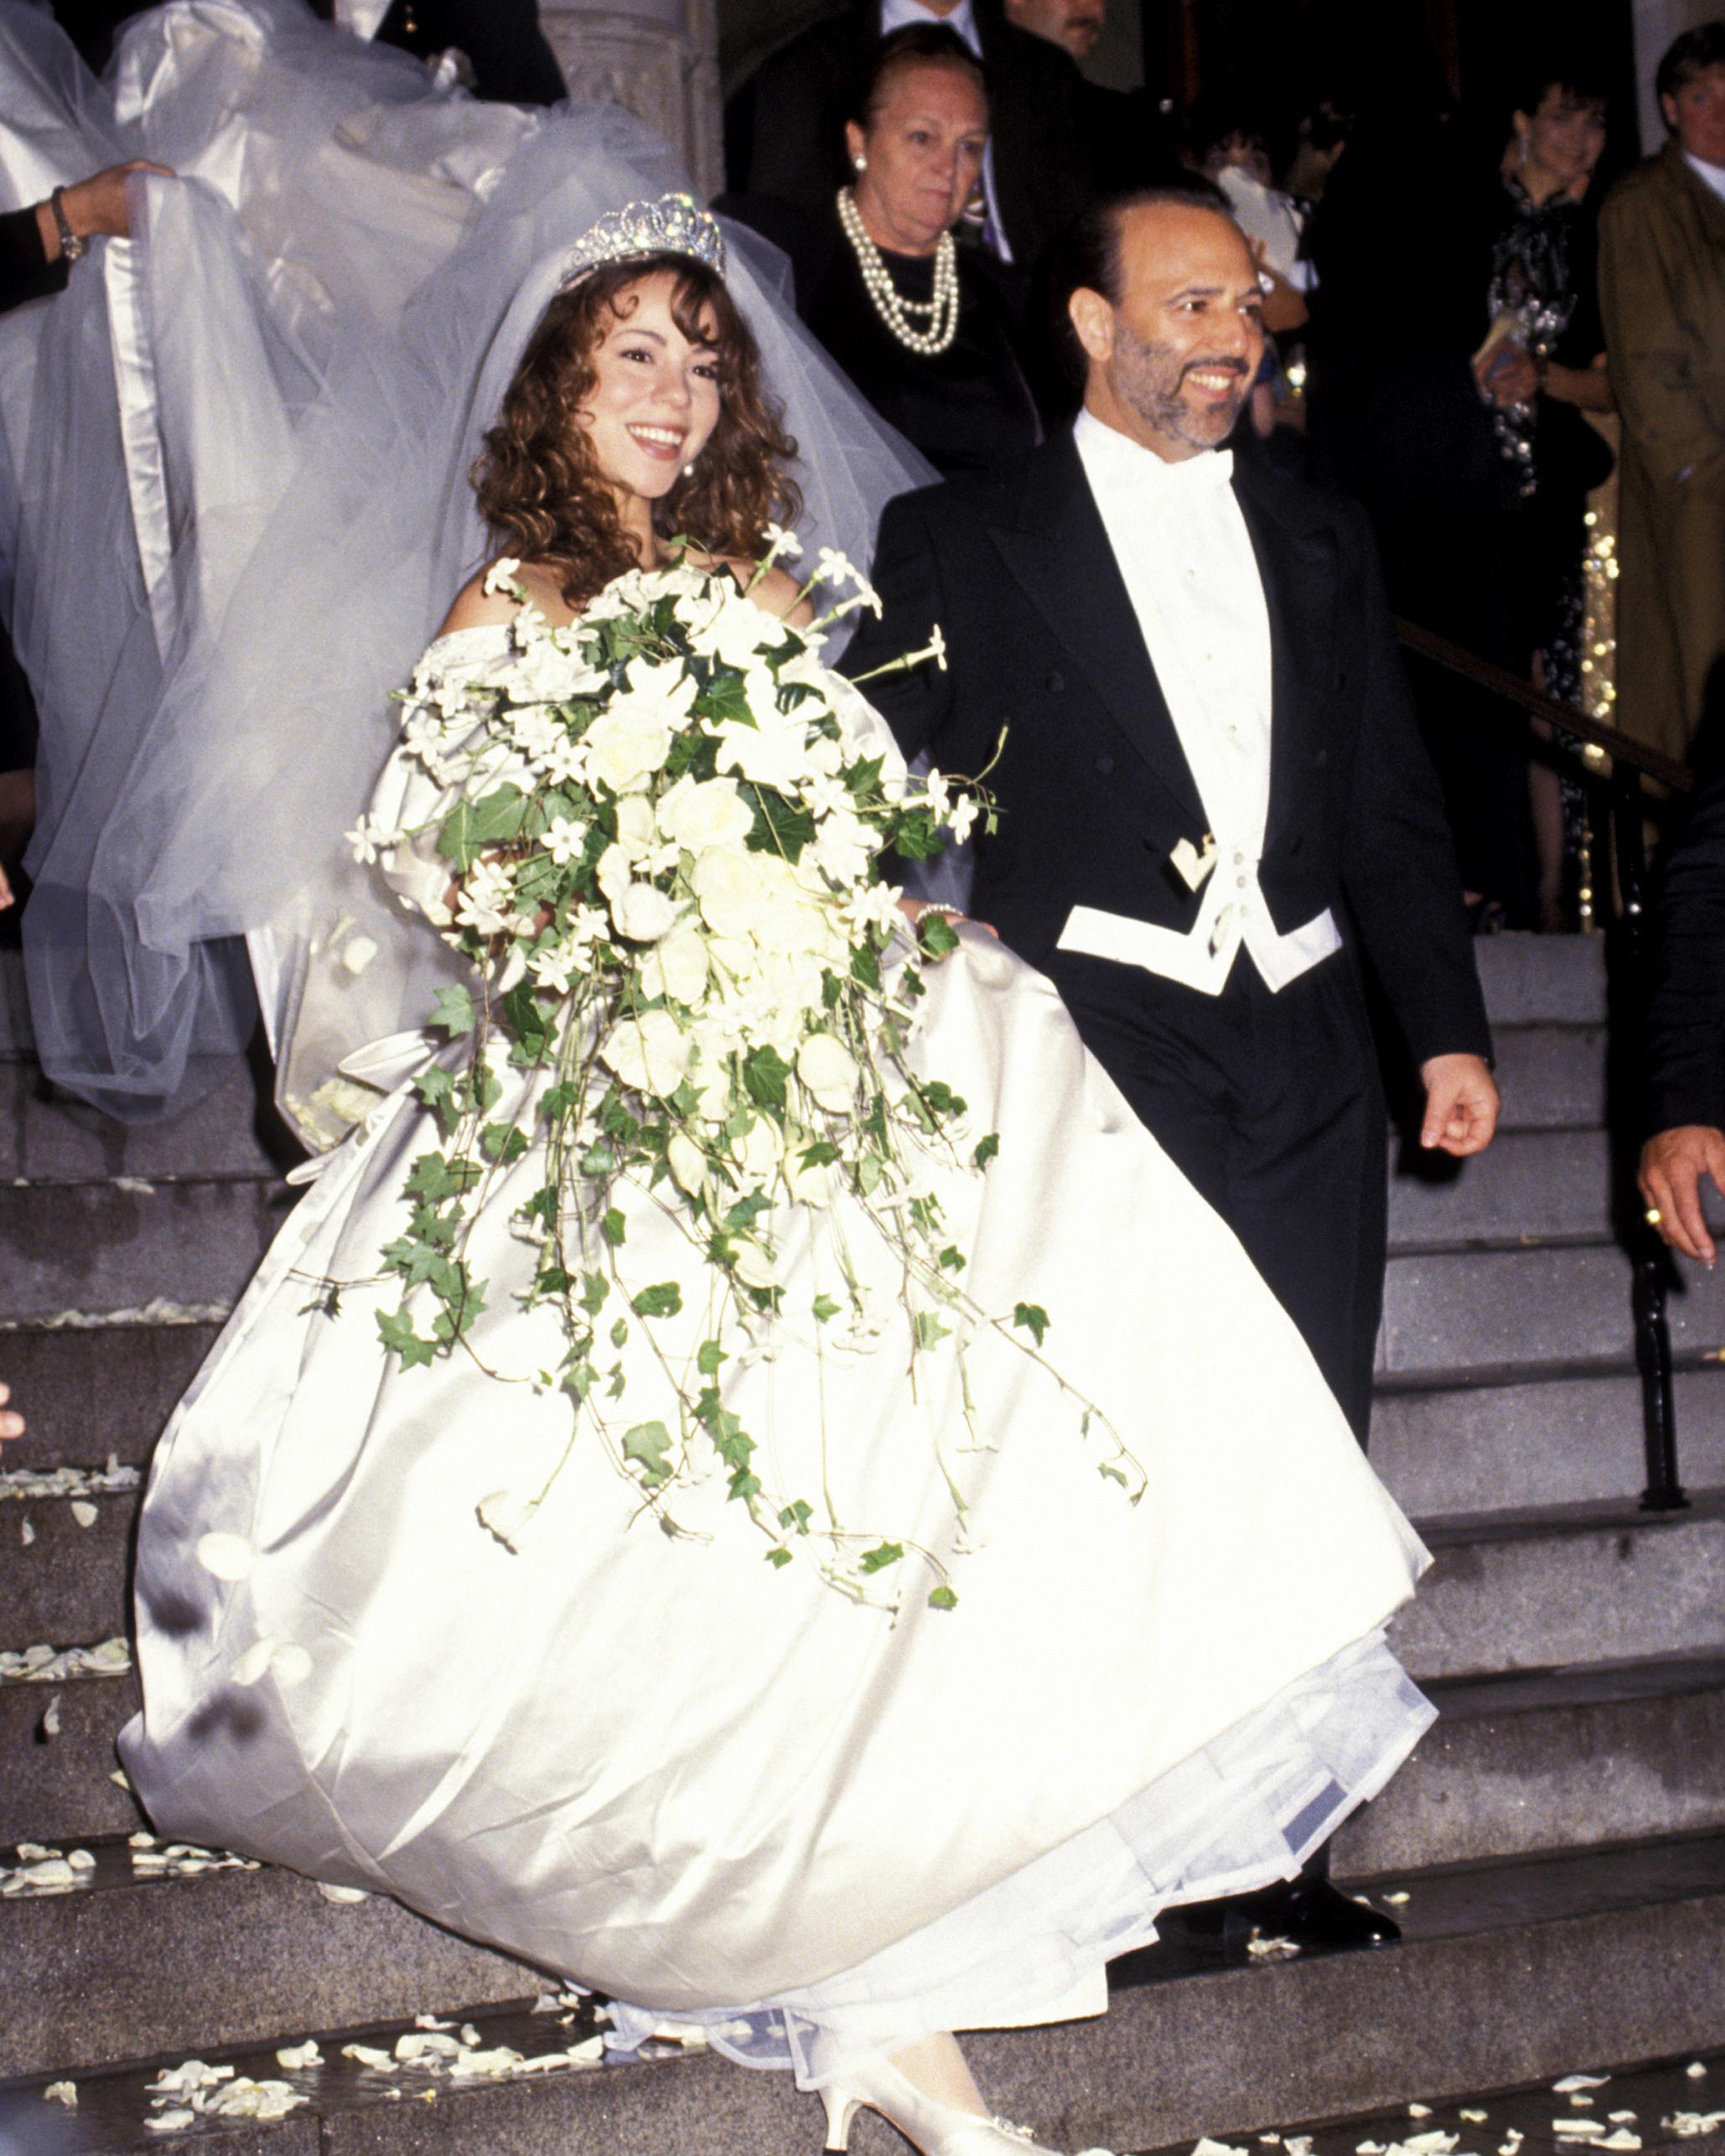 mariah-carey-tommy-mottola-iconic-rock-n-roll-wedding-photos-0717.jpg